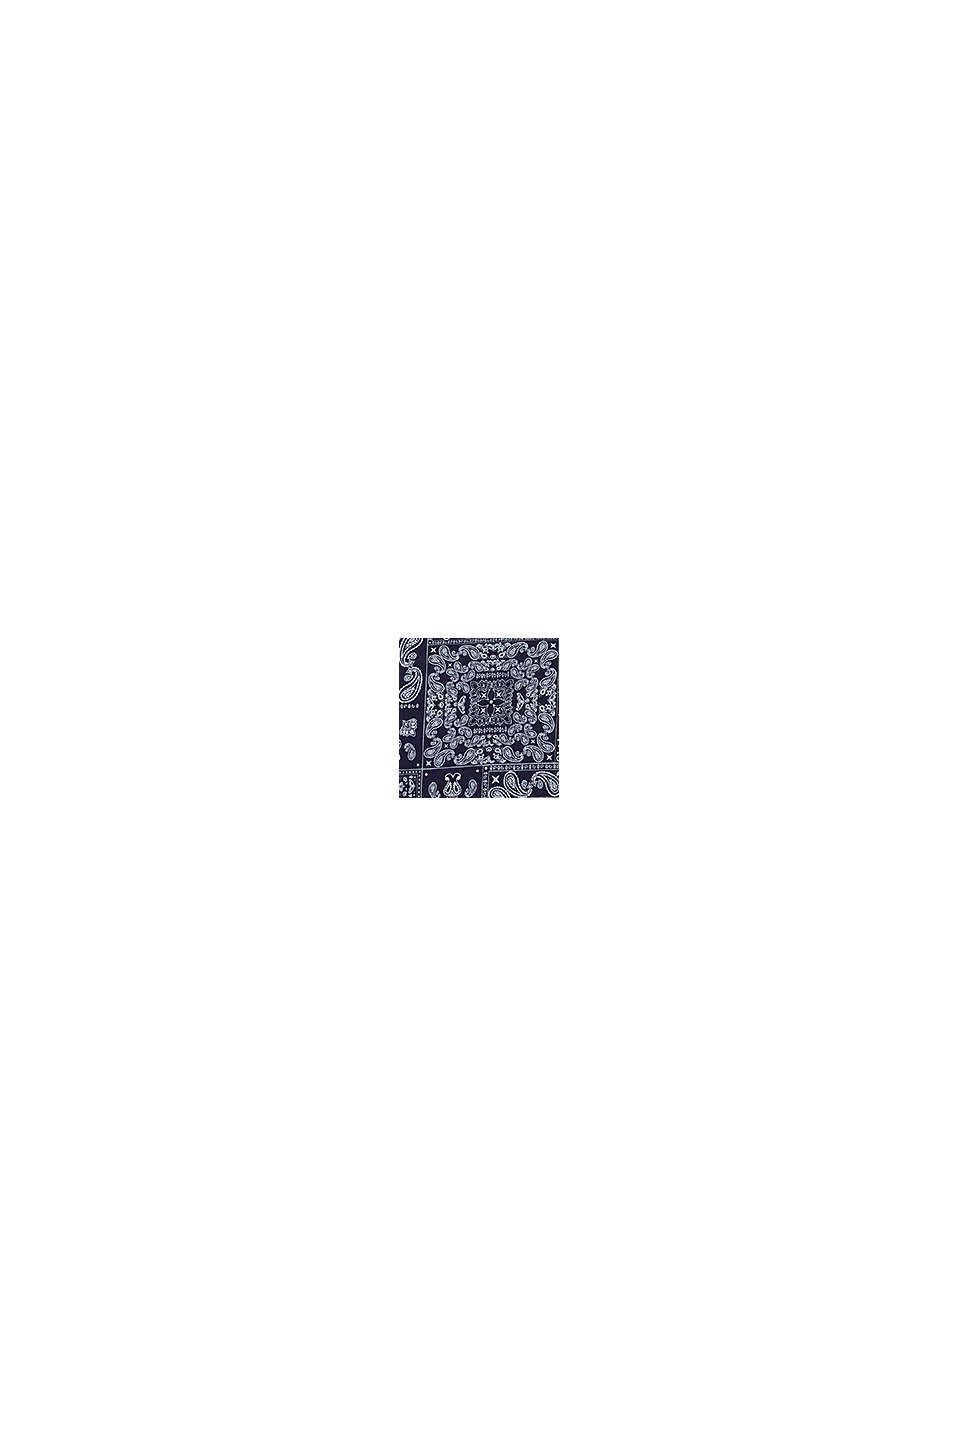 Jersey polo shirt with a bandana print, 100% cotton, NAVY, swatch